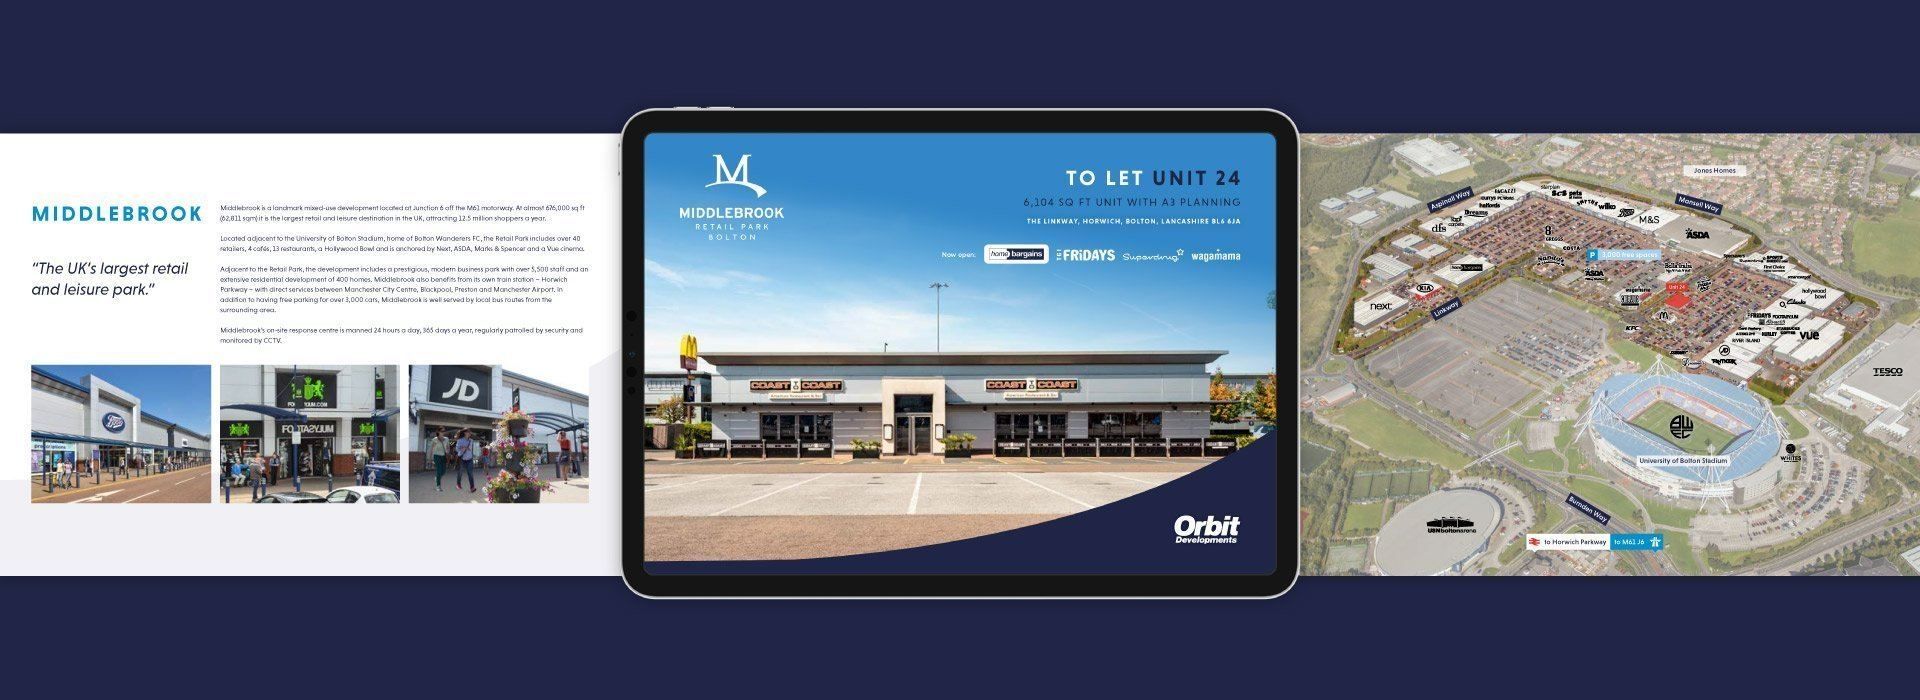 Branding Concept for Middlebrook Retail Park